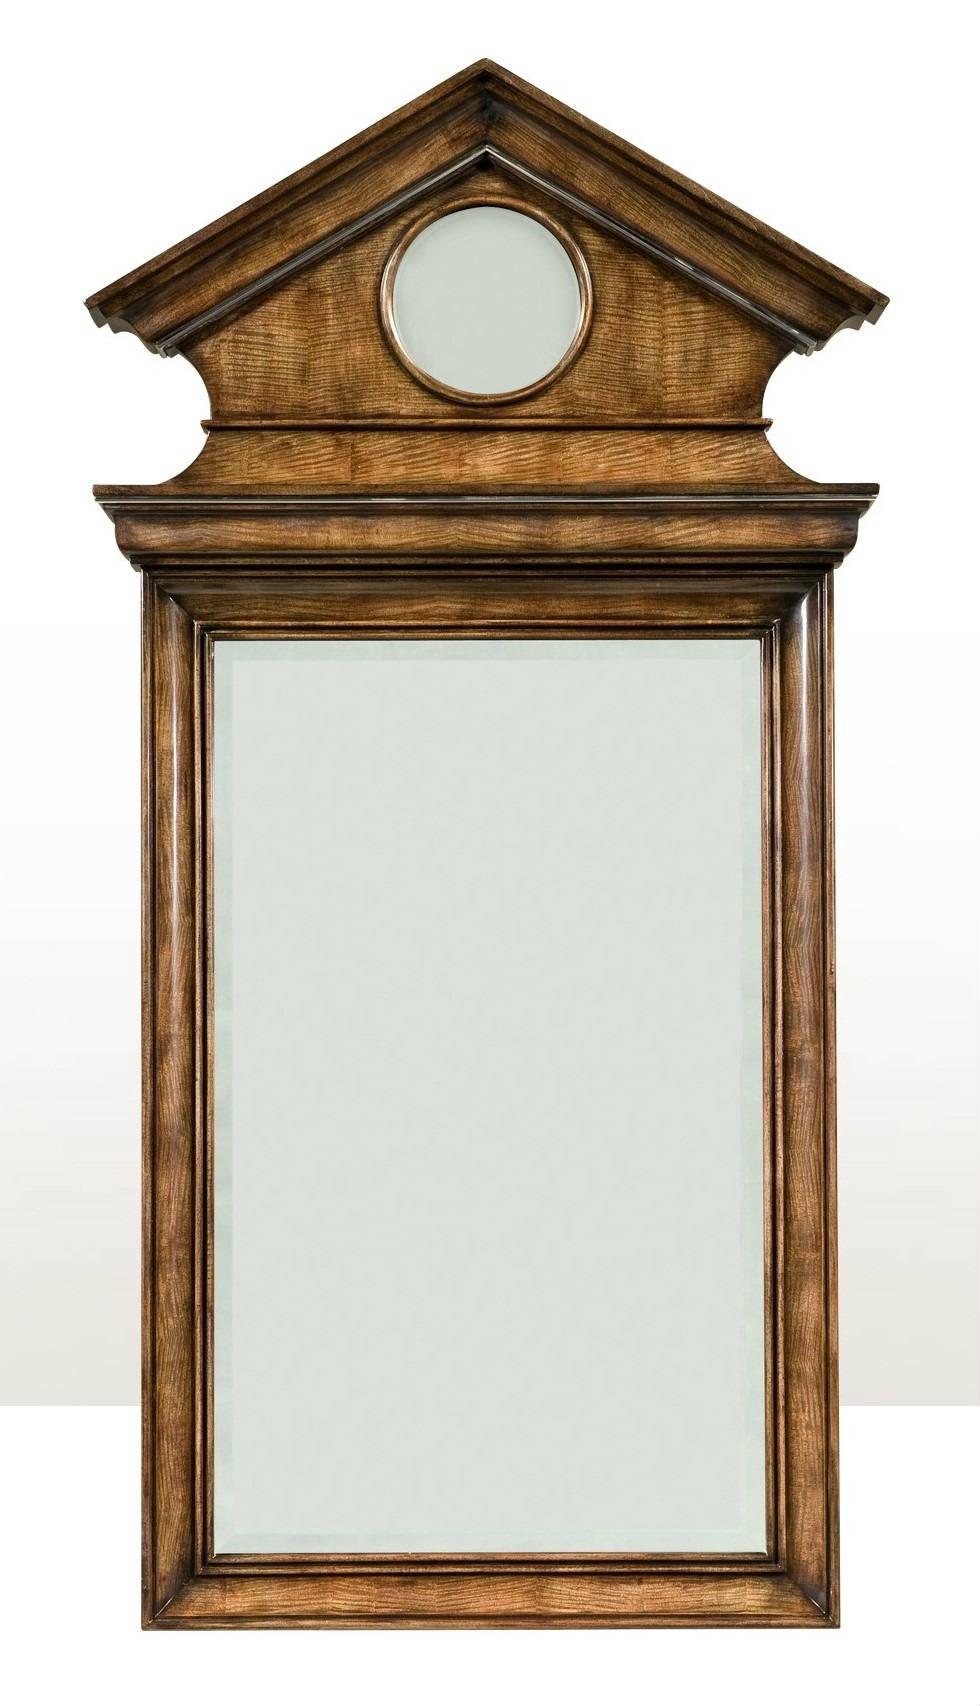 A mahogany and figured anegre veneered wall mirror